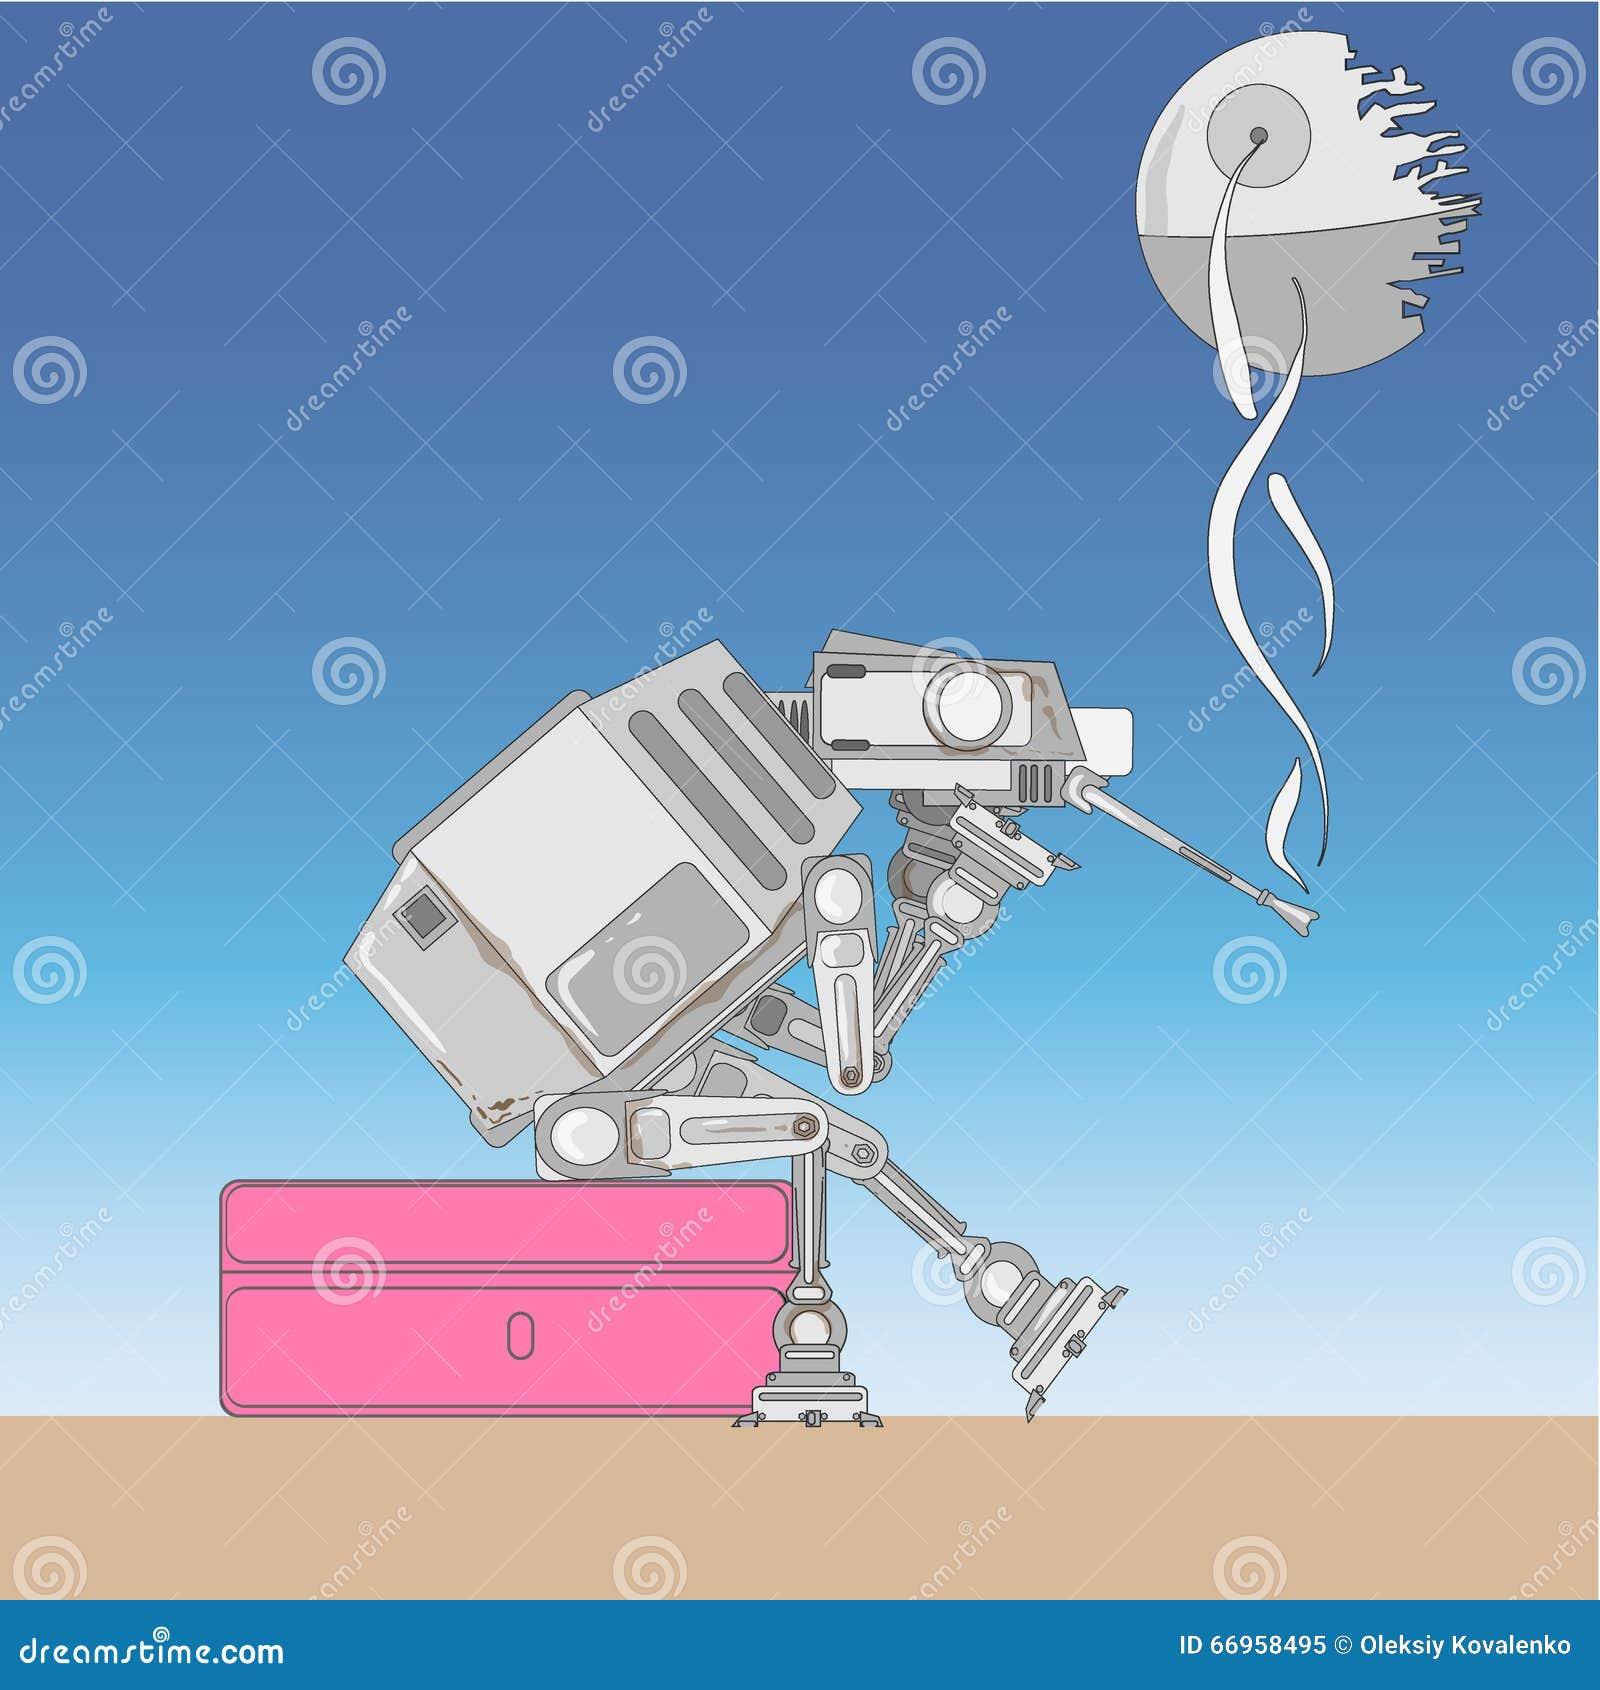 Vehículo inteligente mecanizado armado pesado